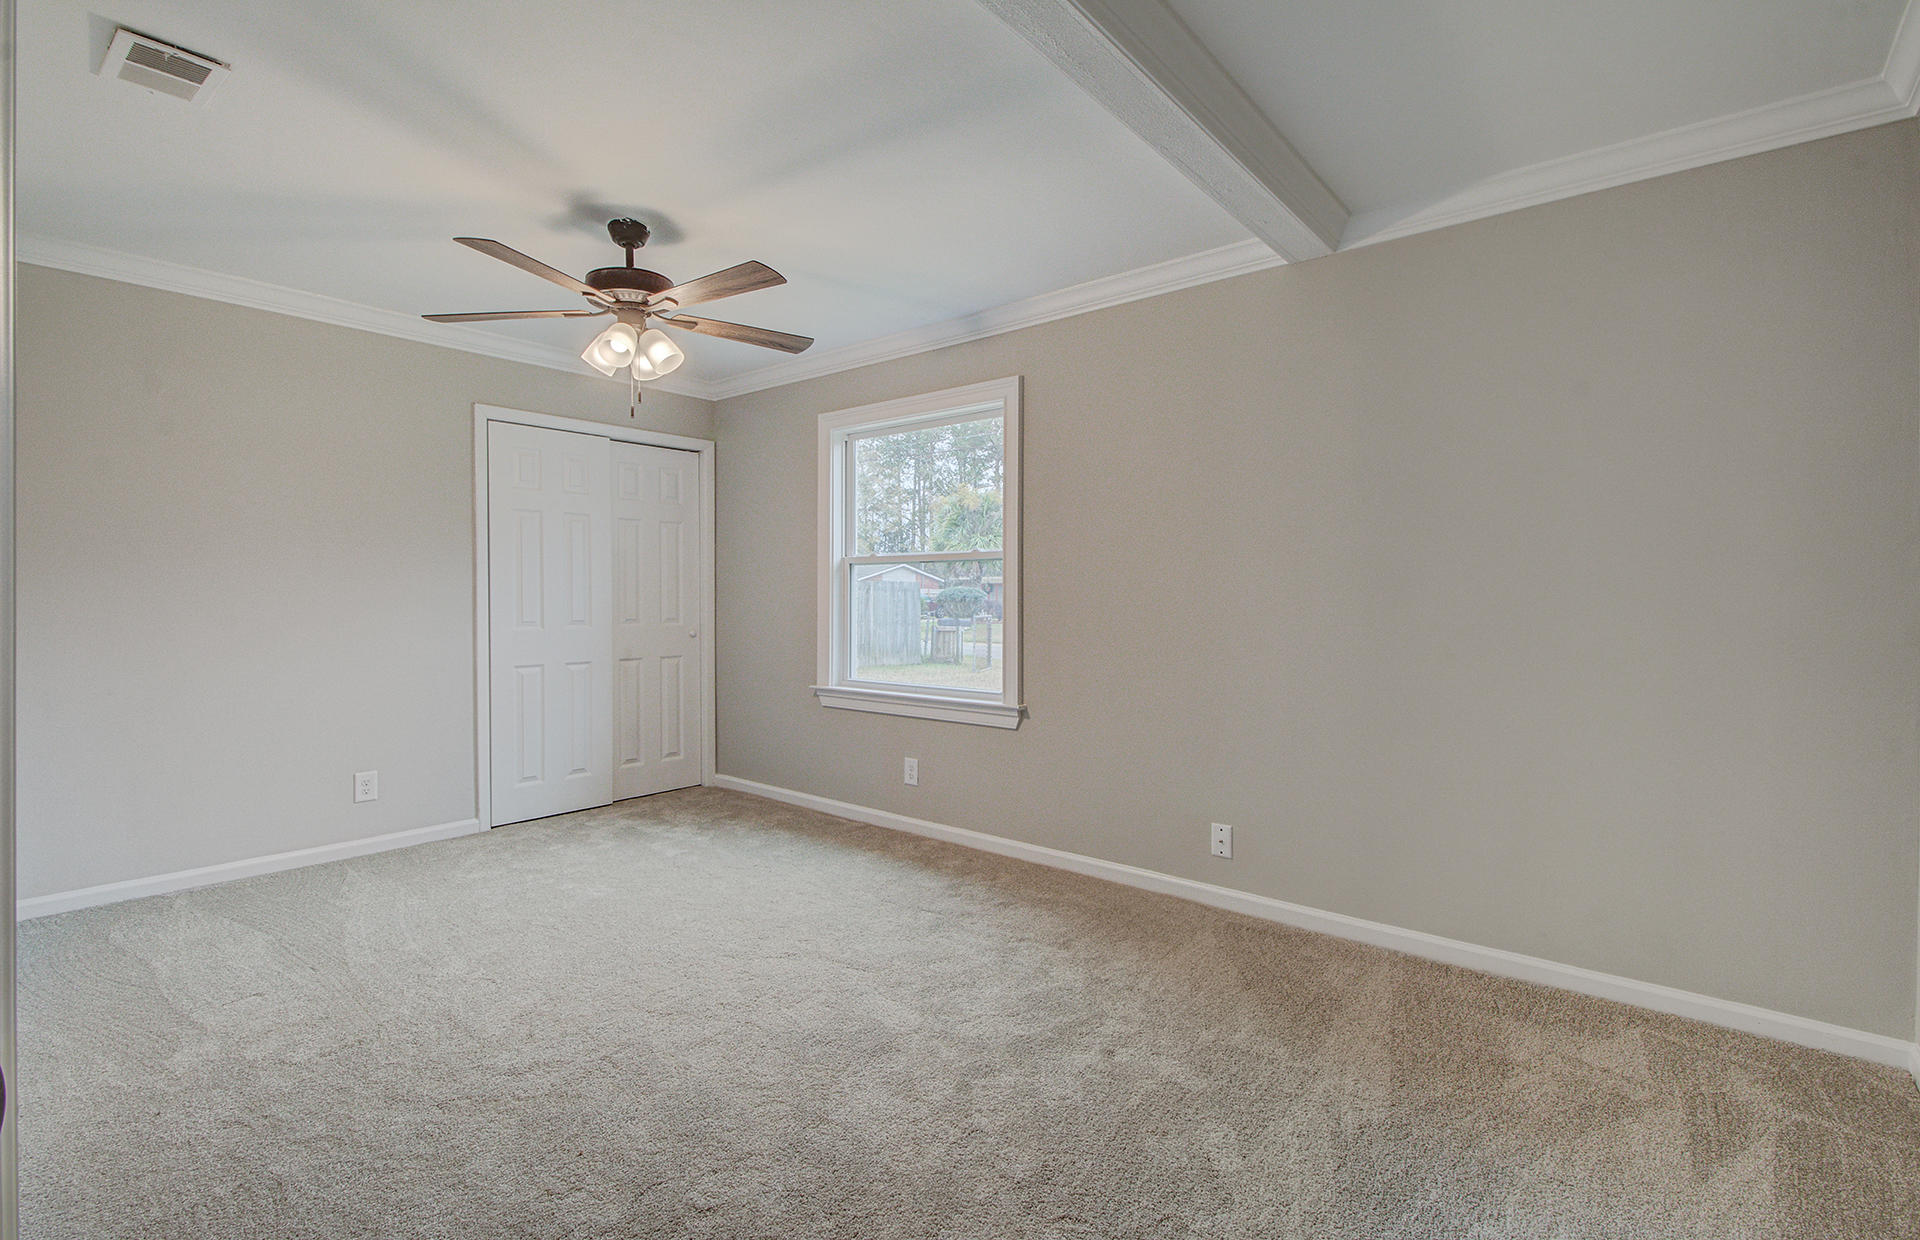 Sedgefield Section I Homes For Sale - 30 Aldene, Goose Creek, SC - 7